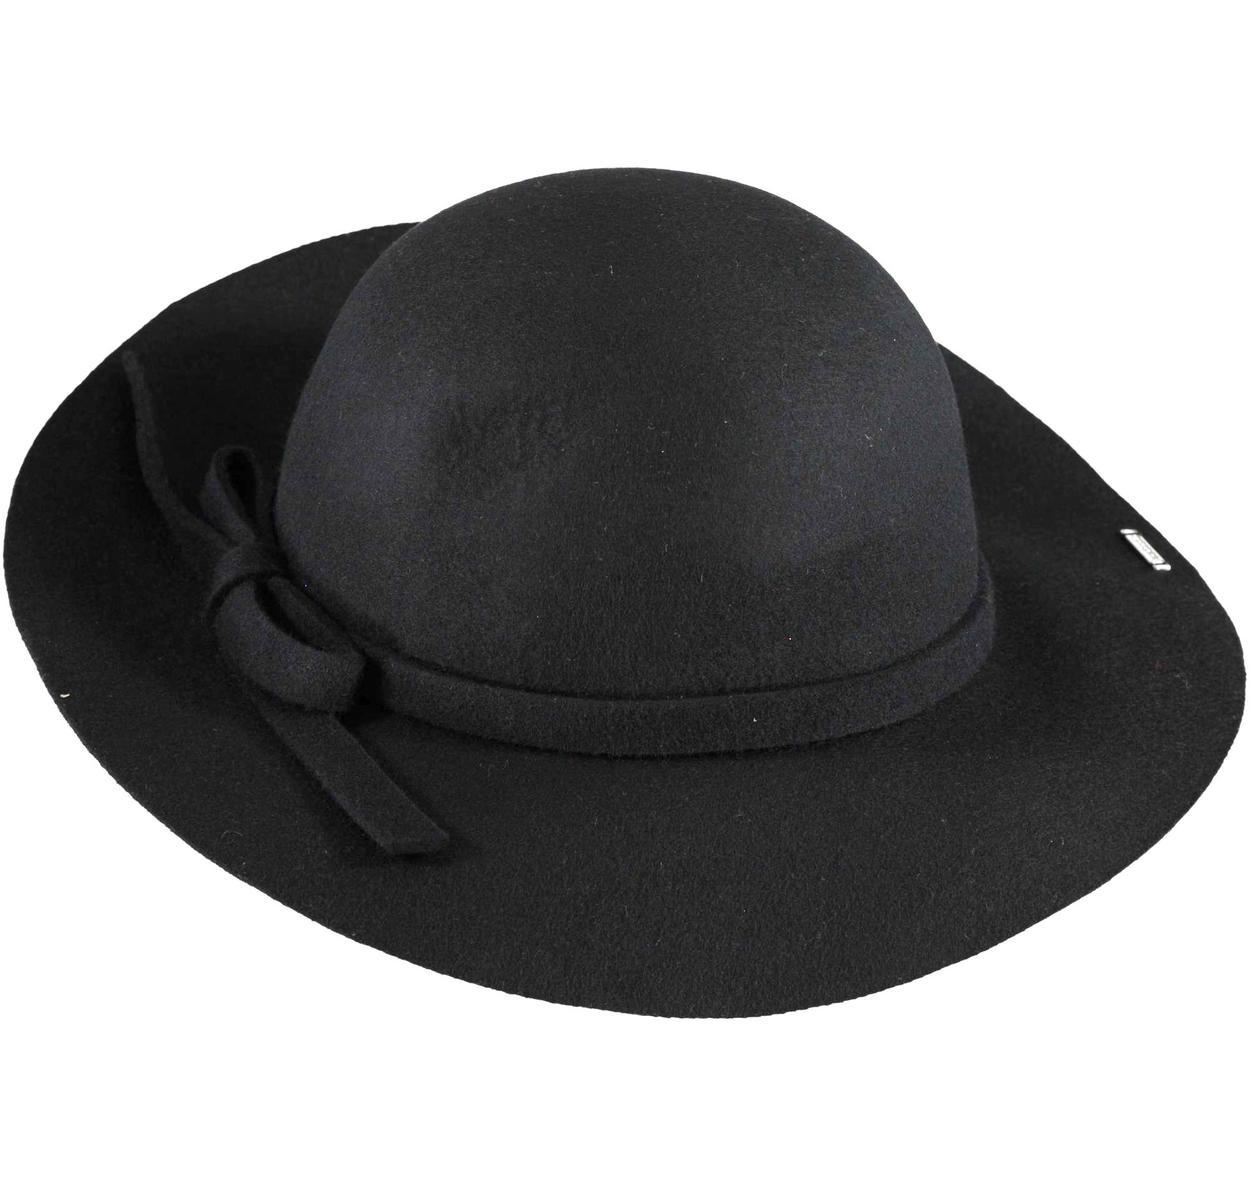 Cappello 100% lana modello borsalino per bambina da 6 a 16 anni Sarabanda  NERO- fa744629a1de